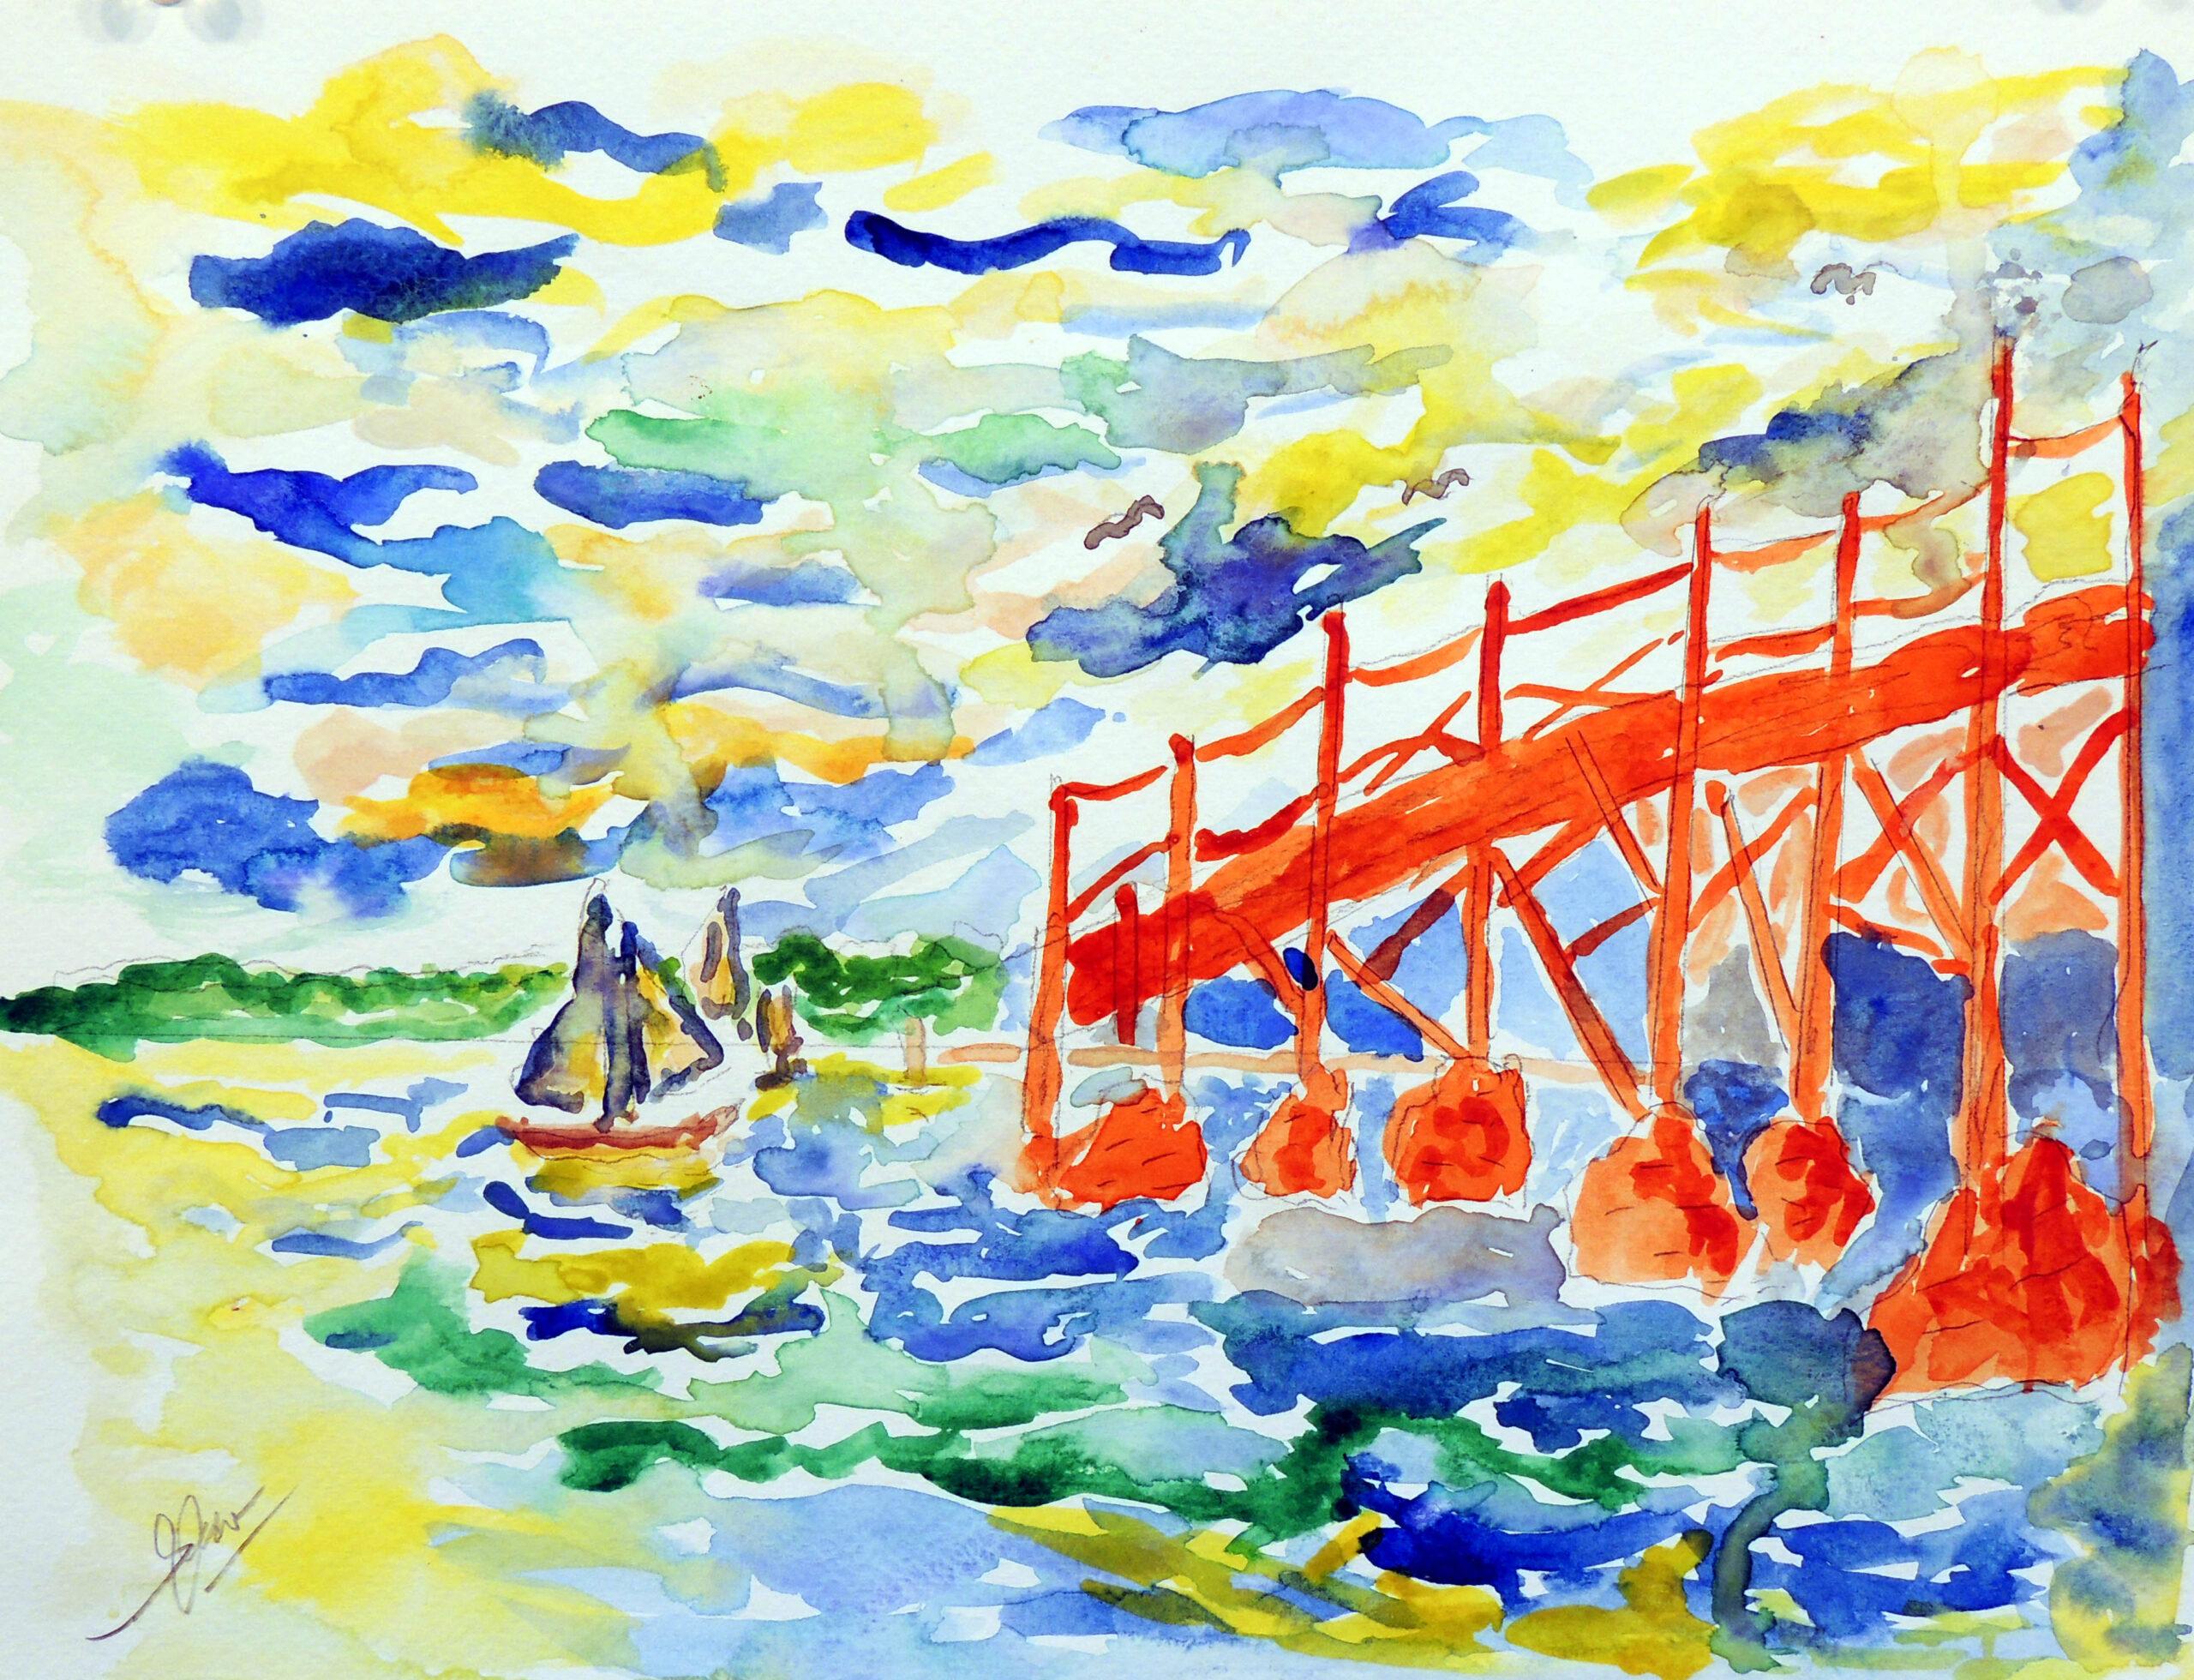 The Beautiful Bay by Robert Sok